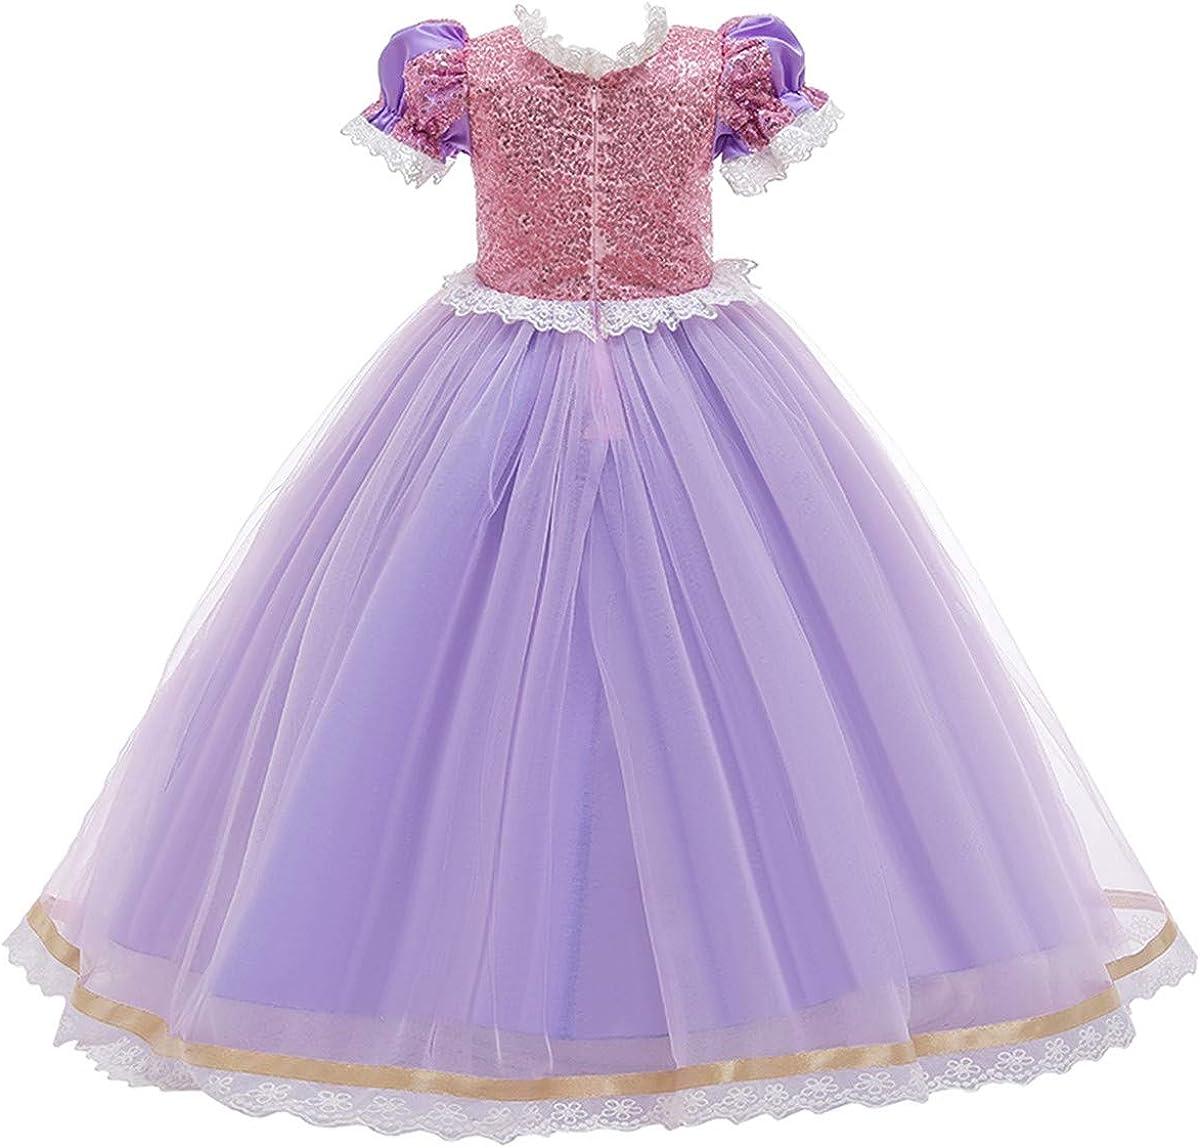 MYRISAM Girls Sofia The First Rapunzel Princess Halloween Costume Fancy Party Cosplay Dress Up Fariy Tale Birthday Dress